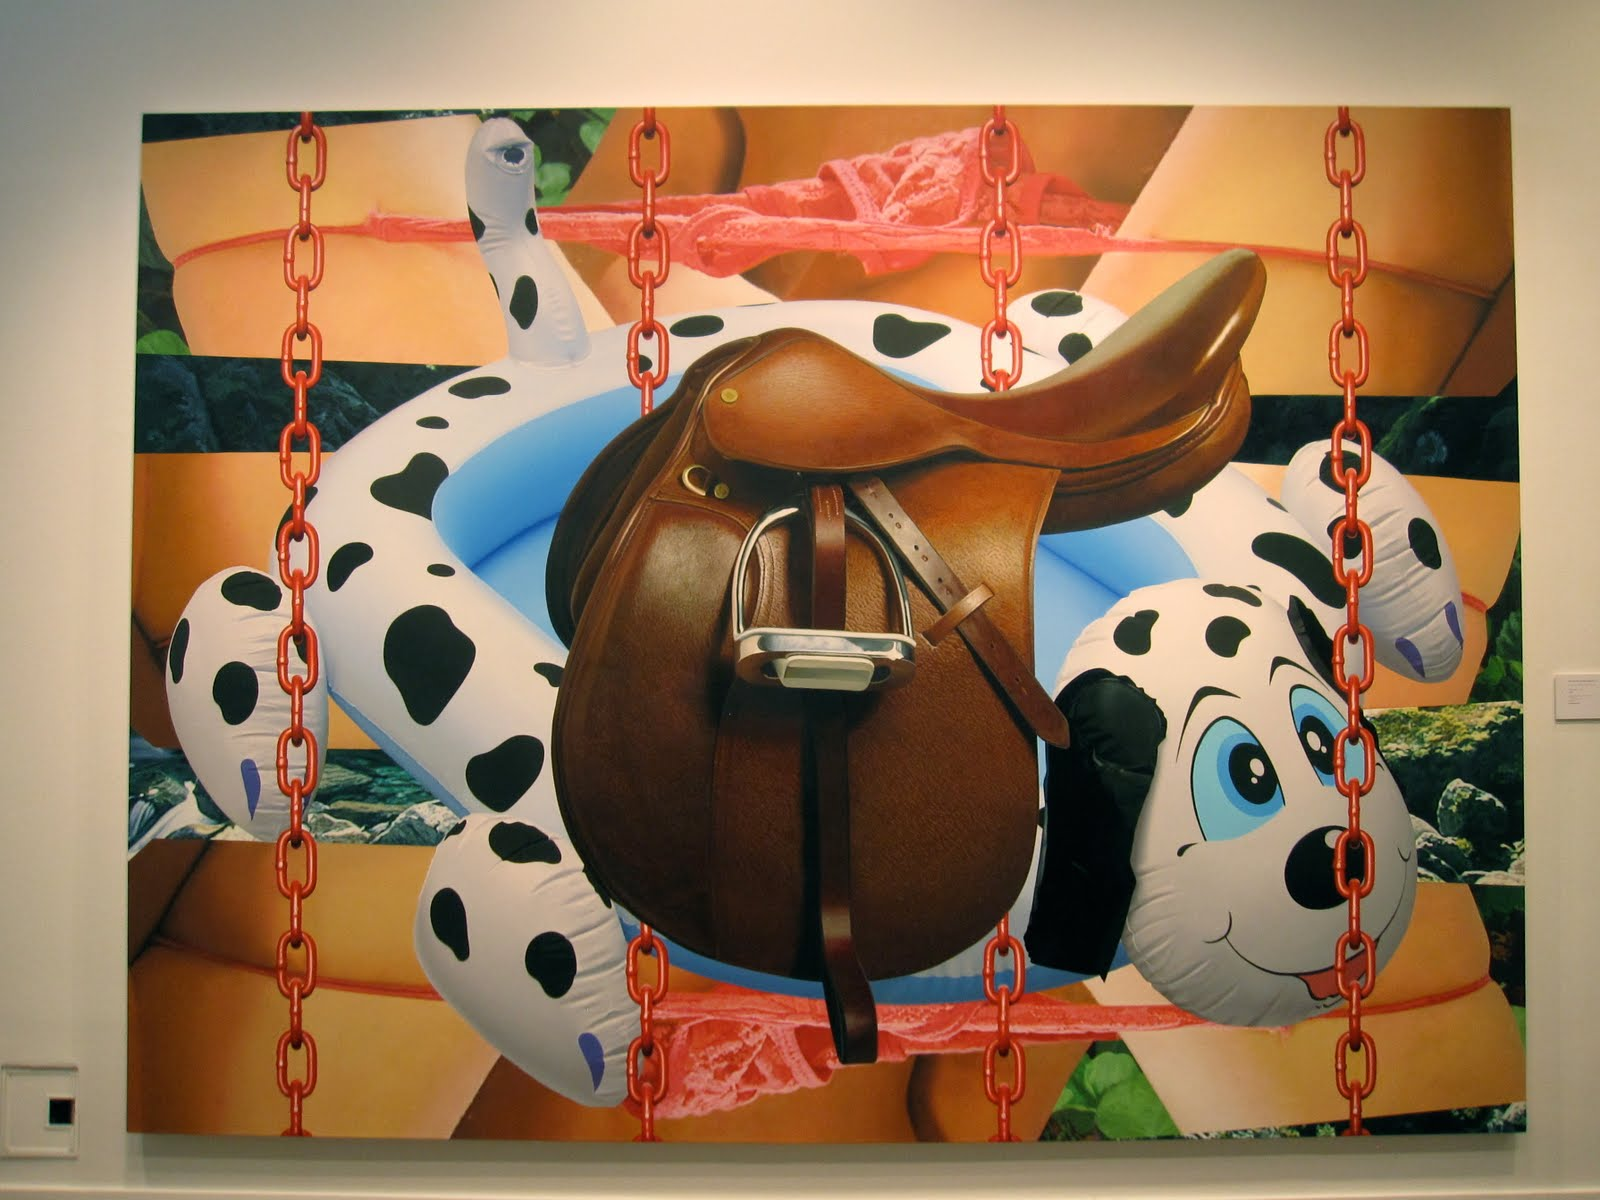 Saddle, 2003 - Jeff Koons - WikiArt.org